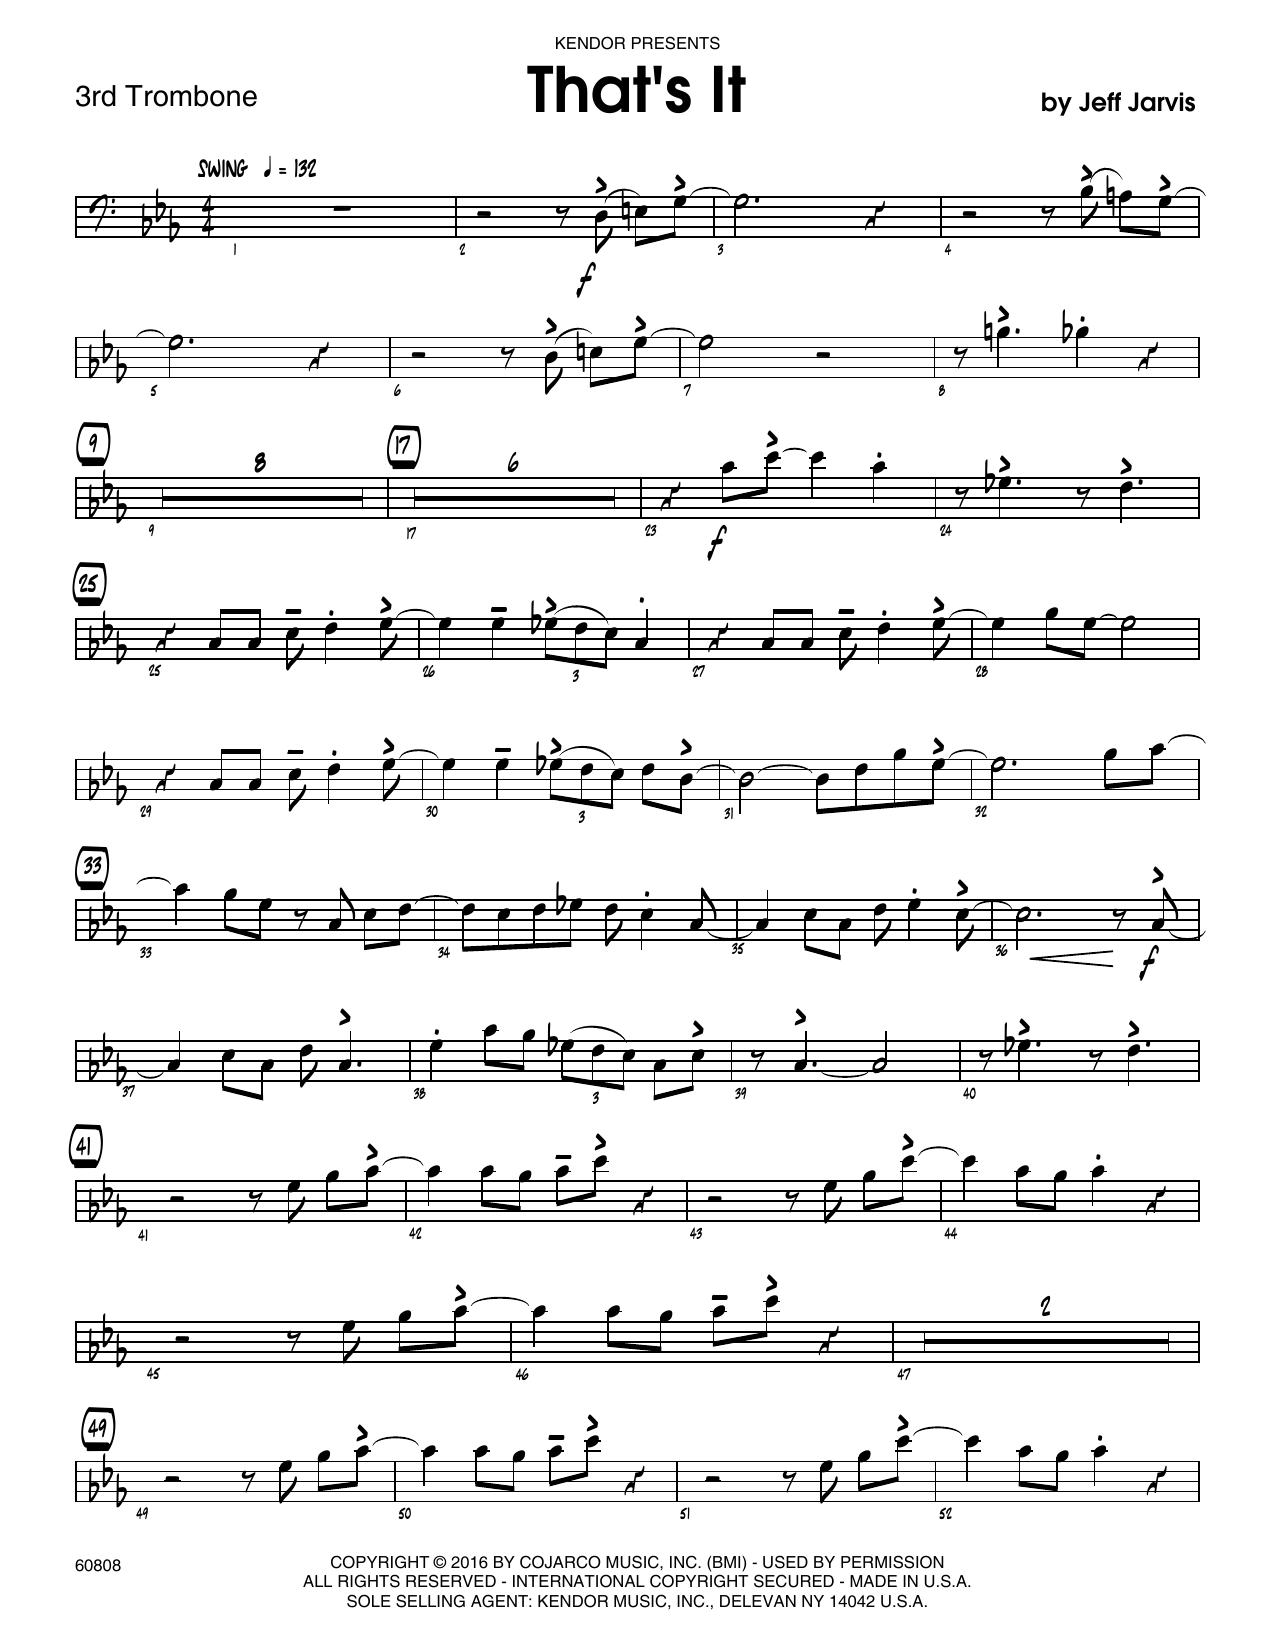 That's It - 3rd Trombone Sheet Music